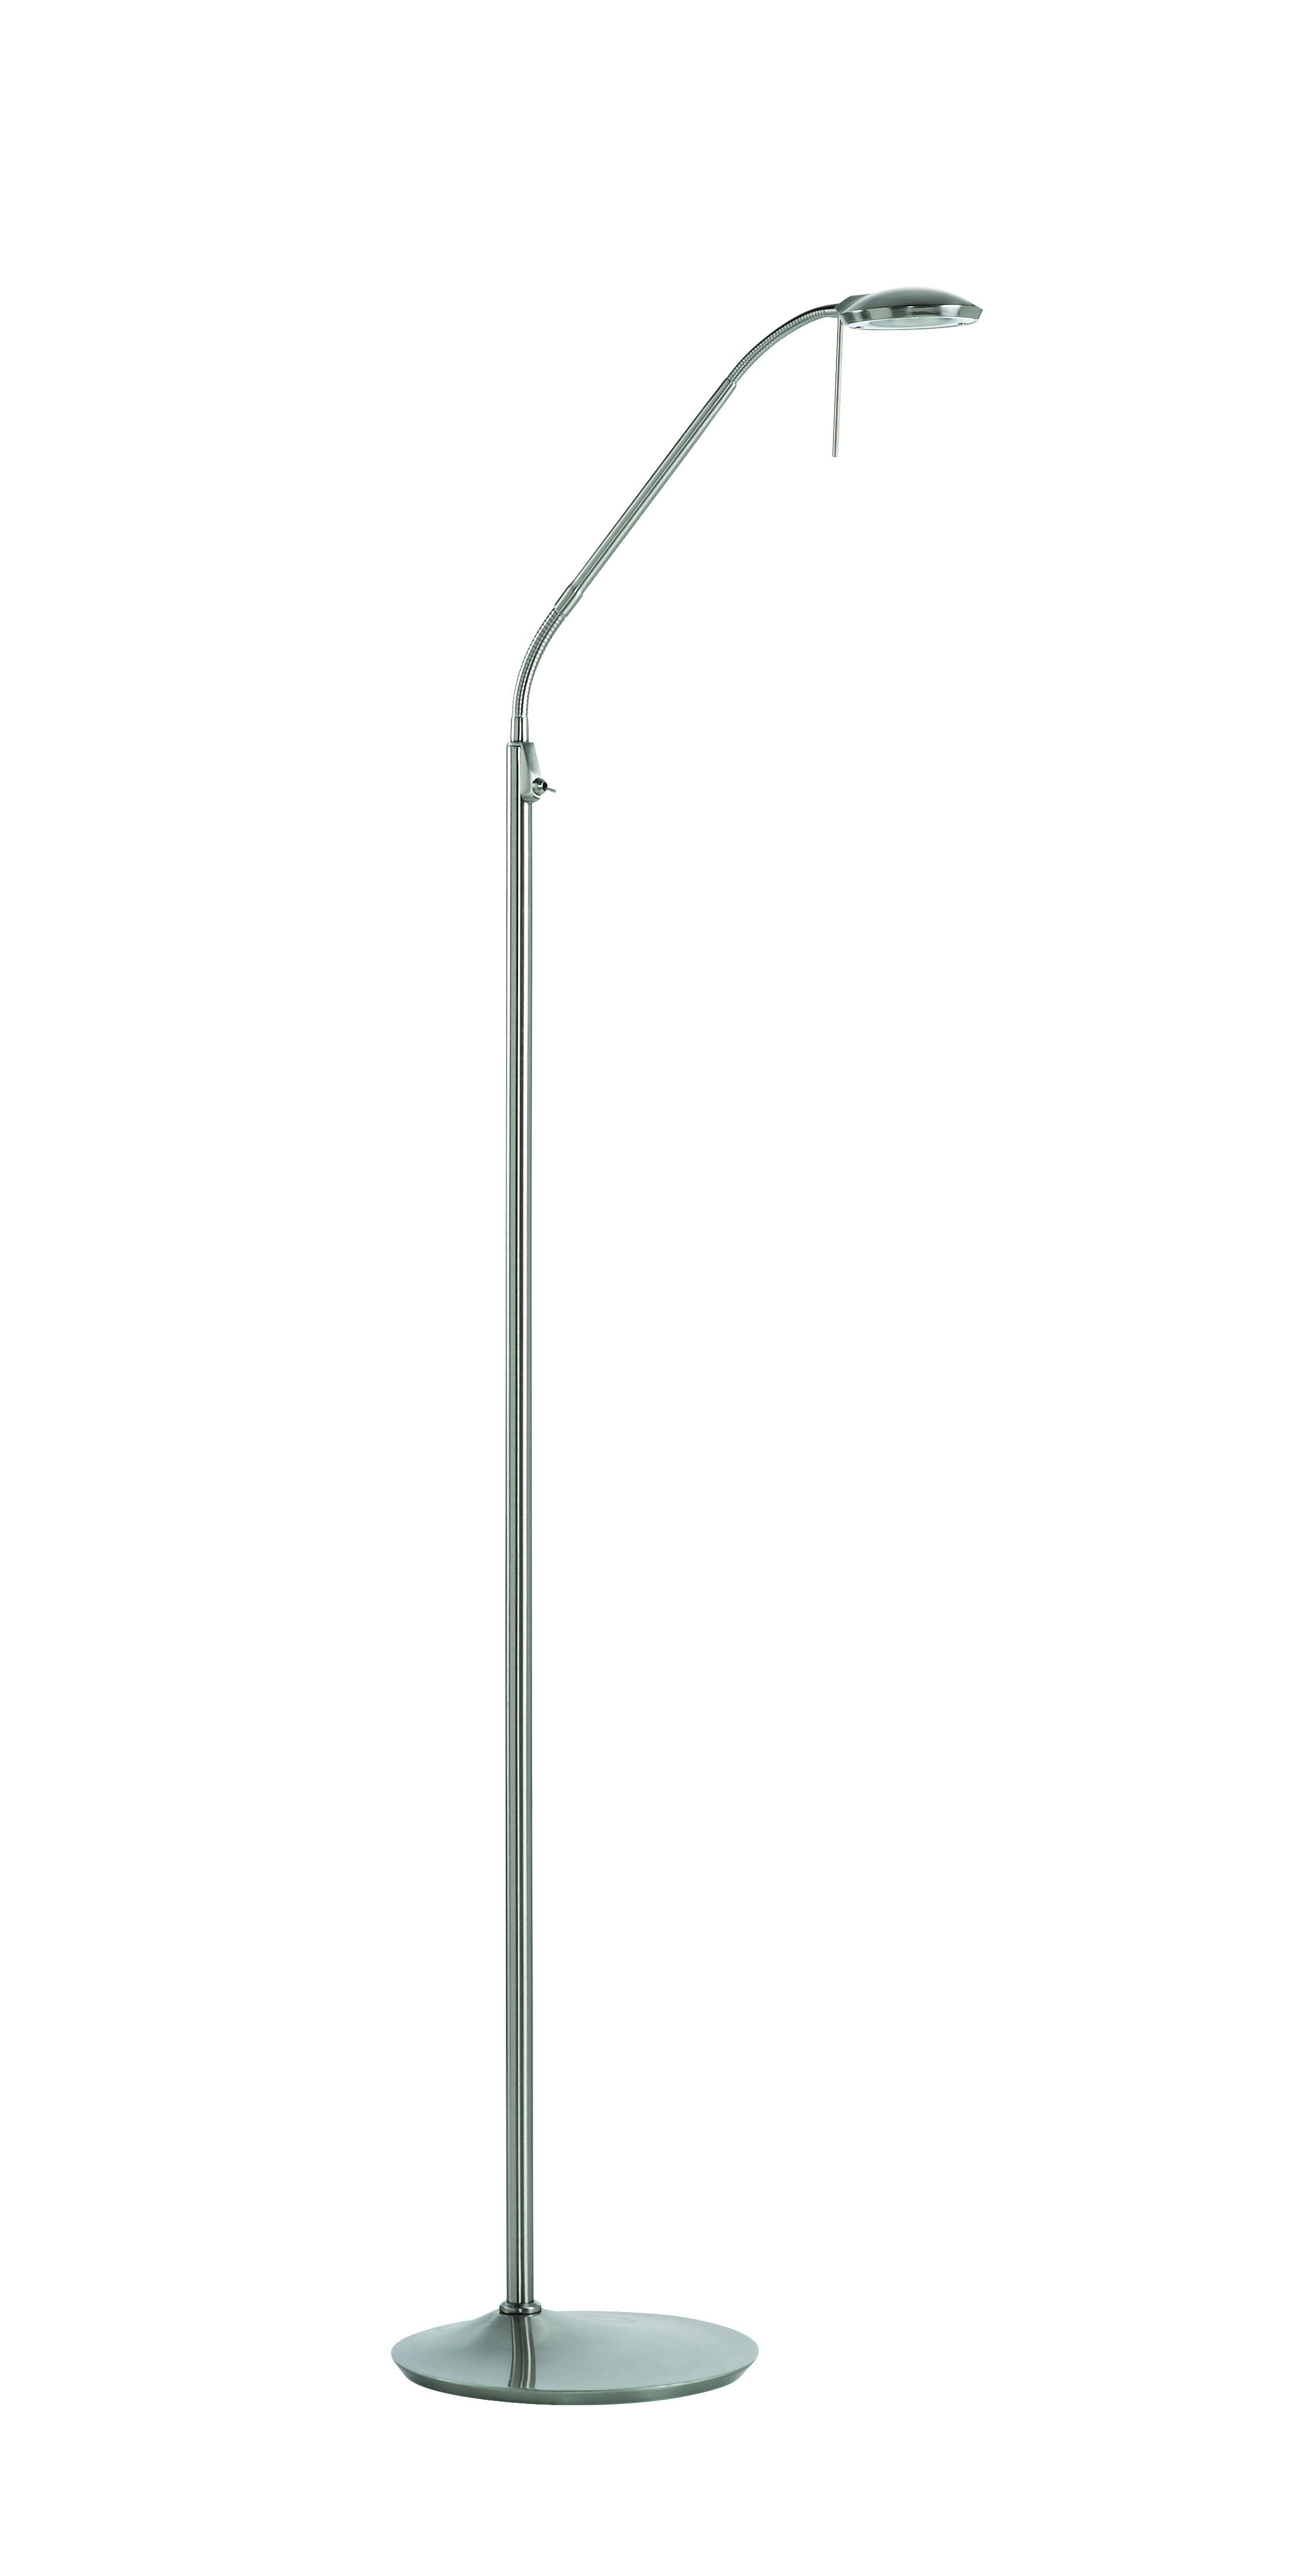 liseuse led sur pied koa chrome mat 5 Incroyable Lampe Led Sur Pied Ojr7